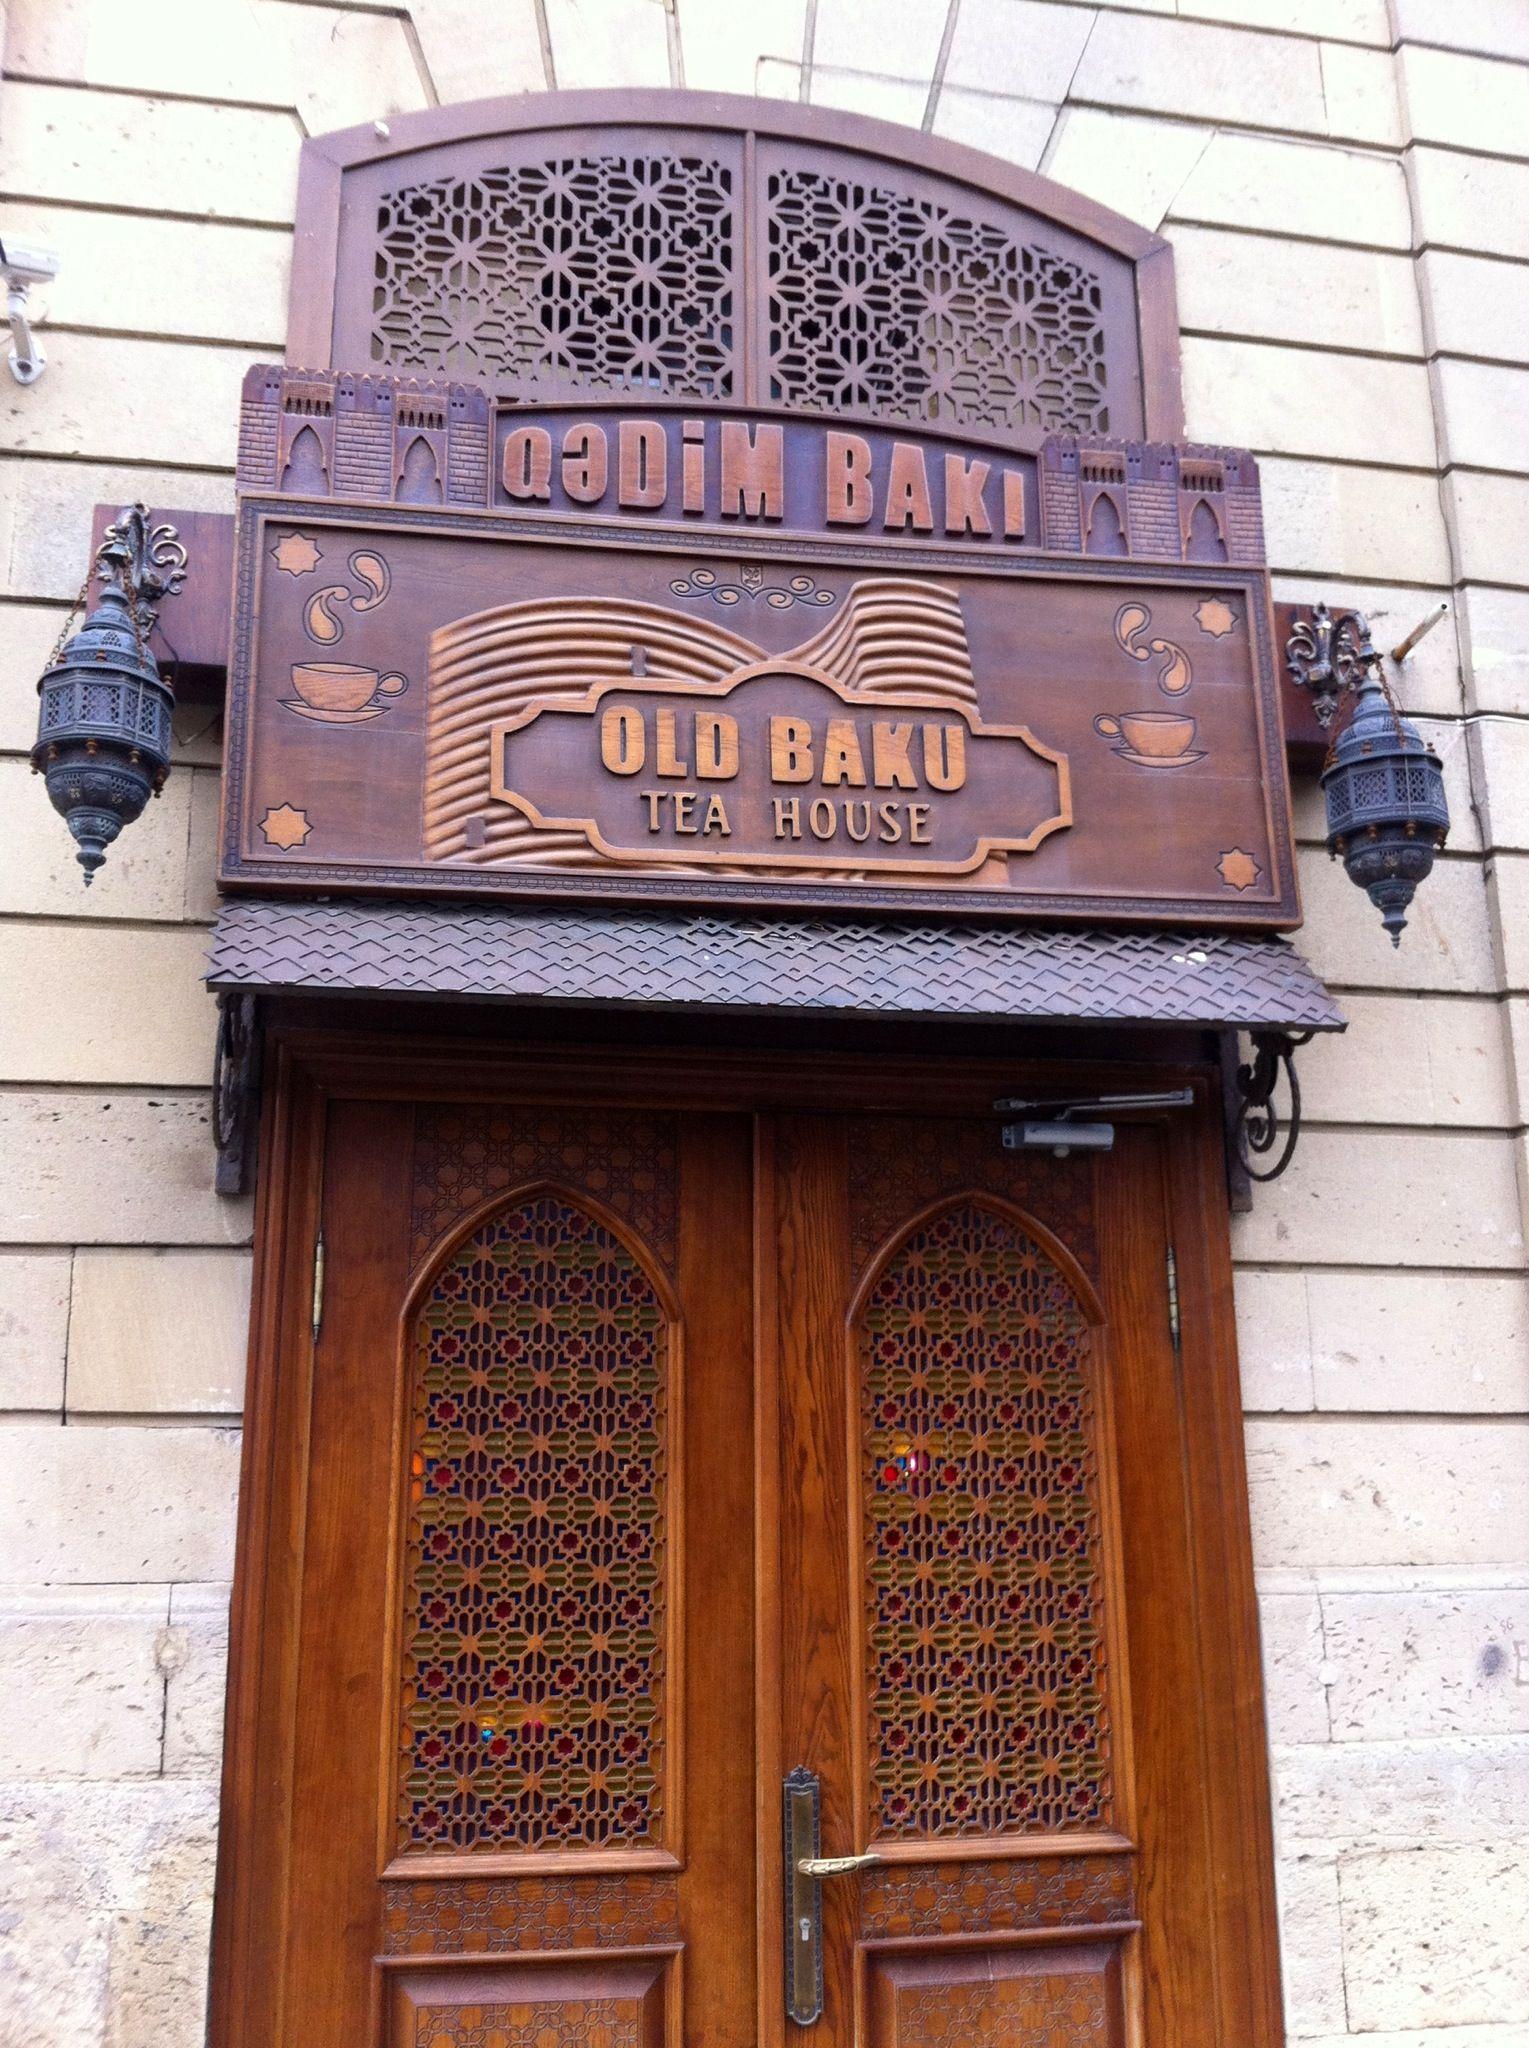 Old Baku Tea House Azerbaijan Tea House Broadway Shows Broadway Show Signs